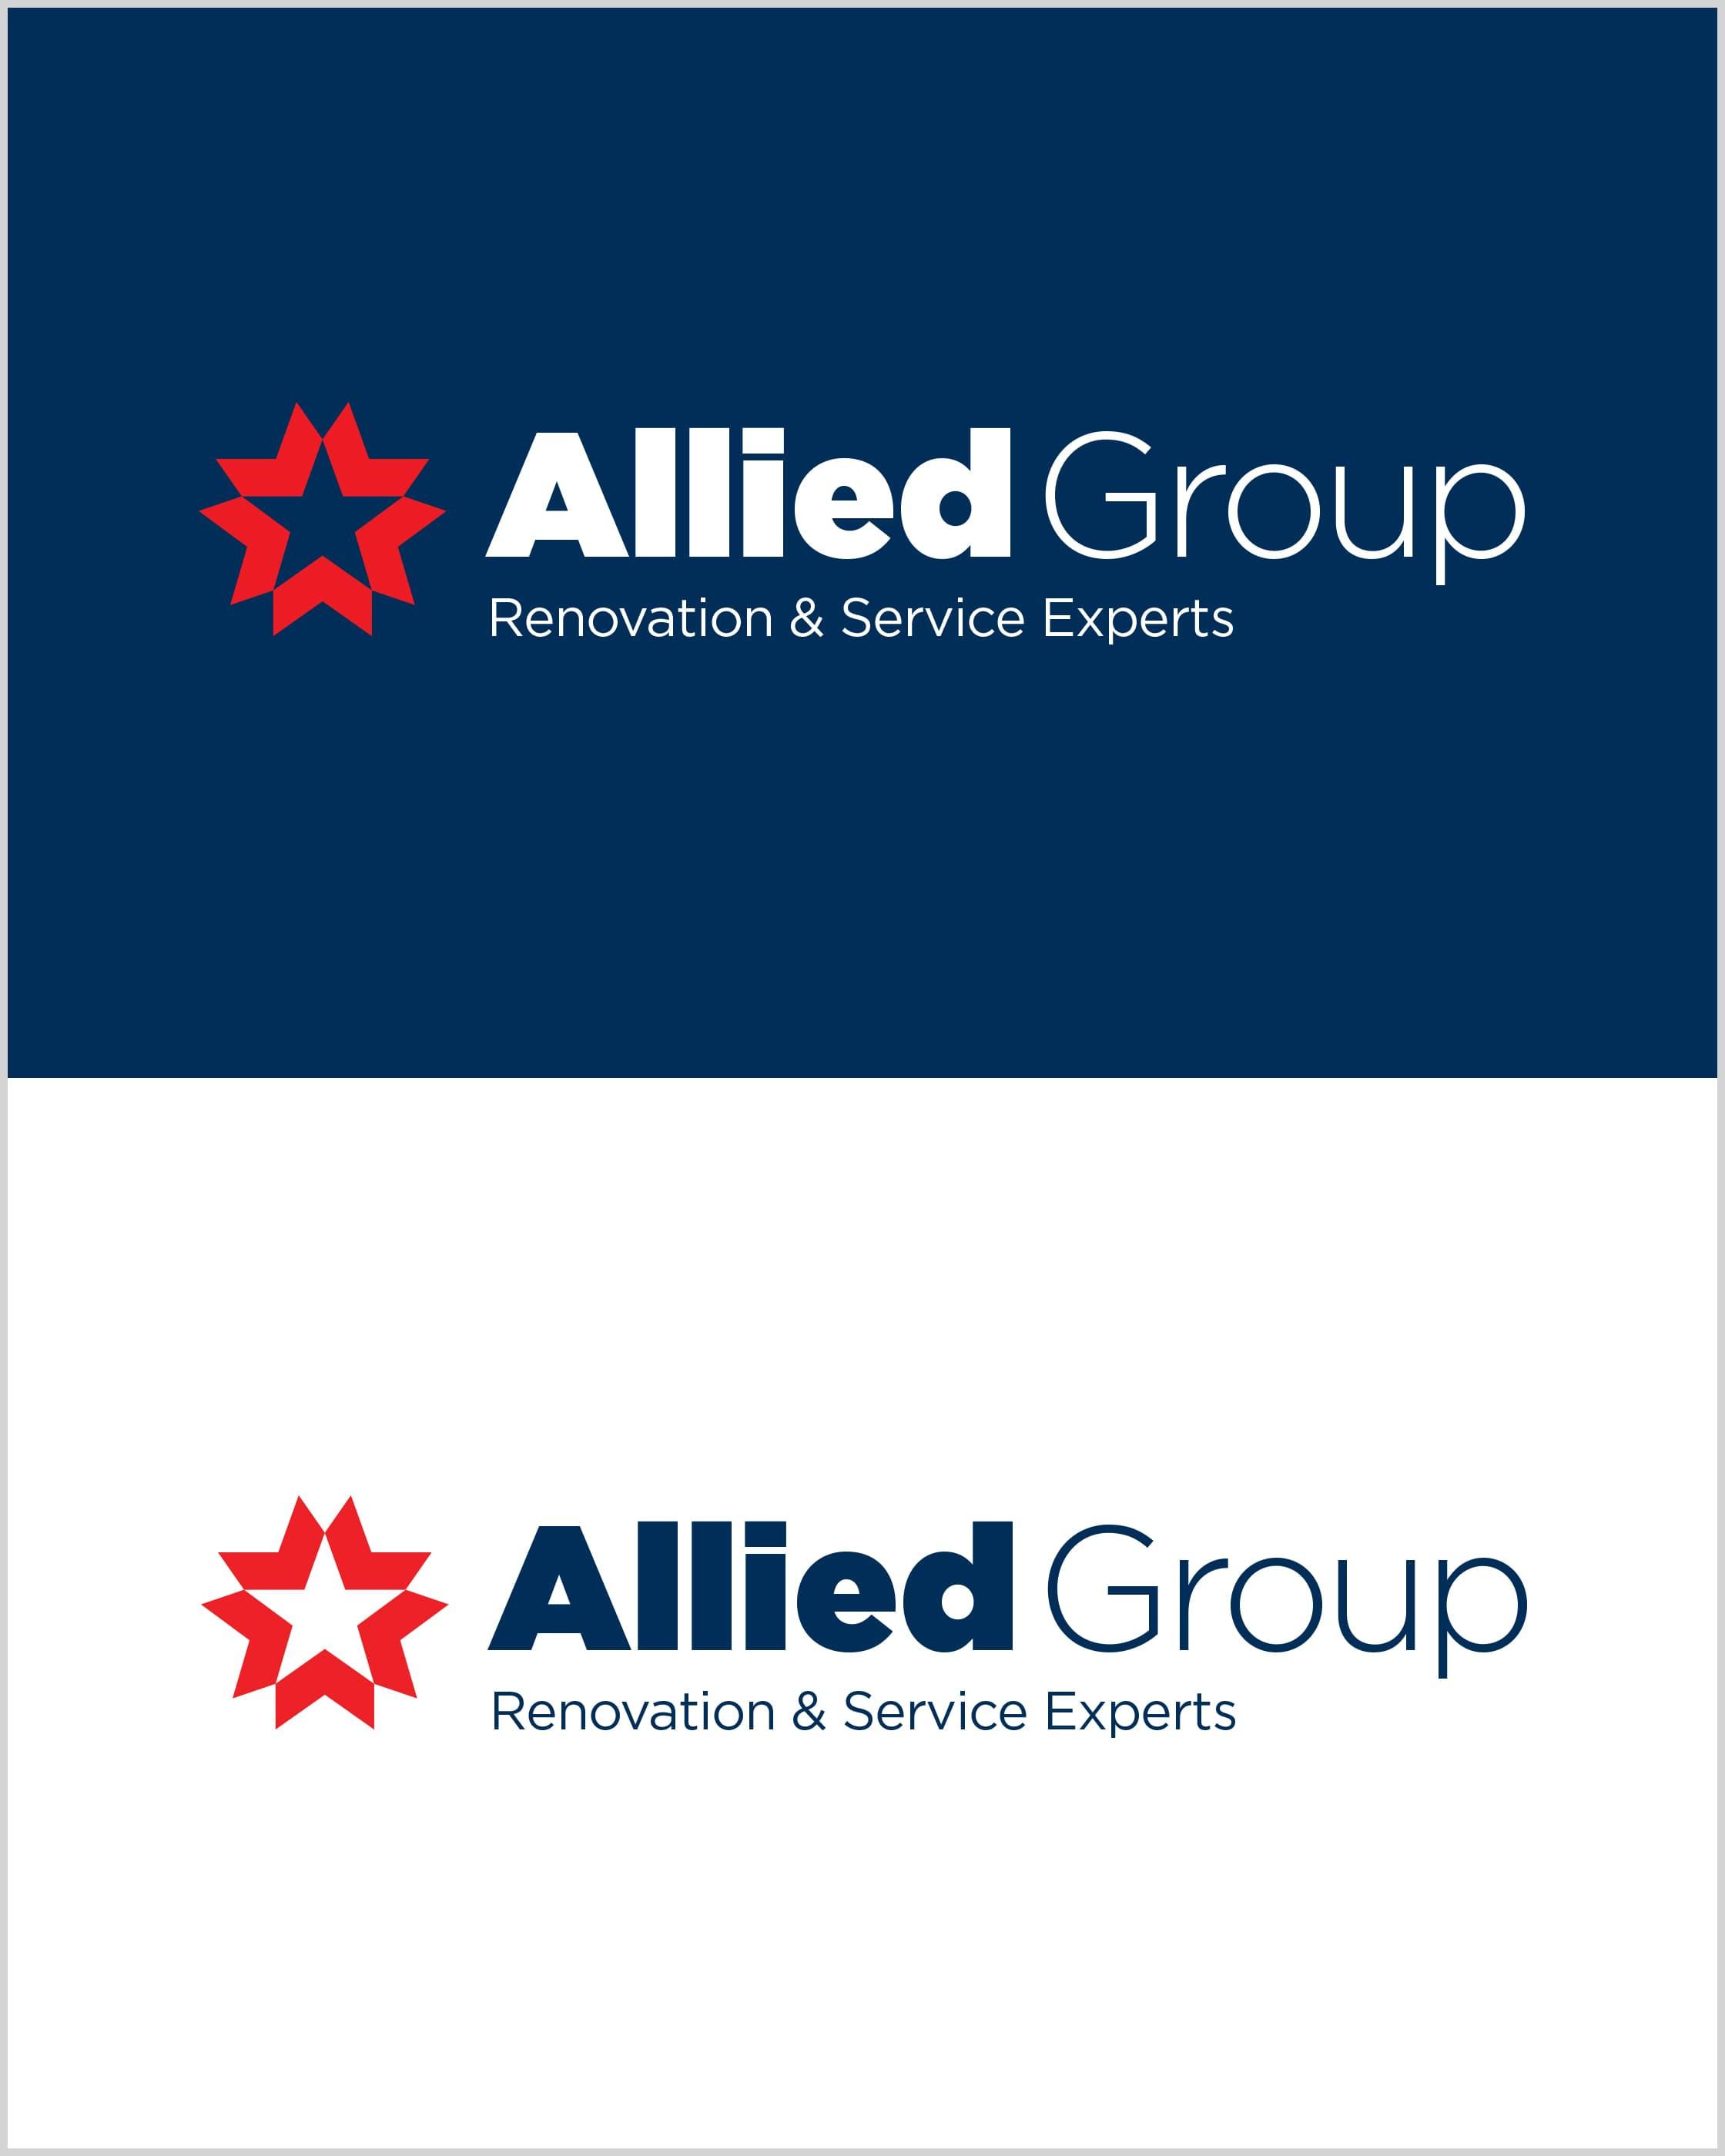 Allied Group Horizontal Logos